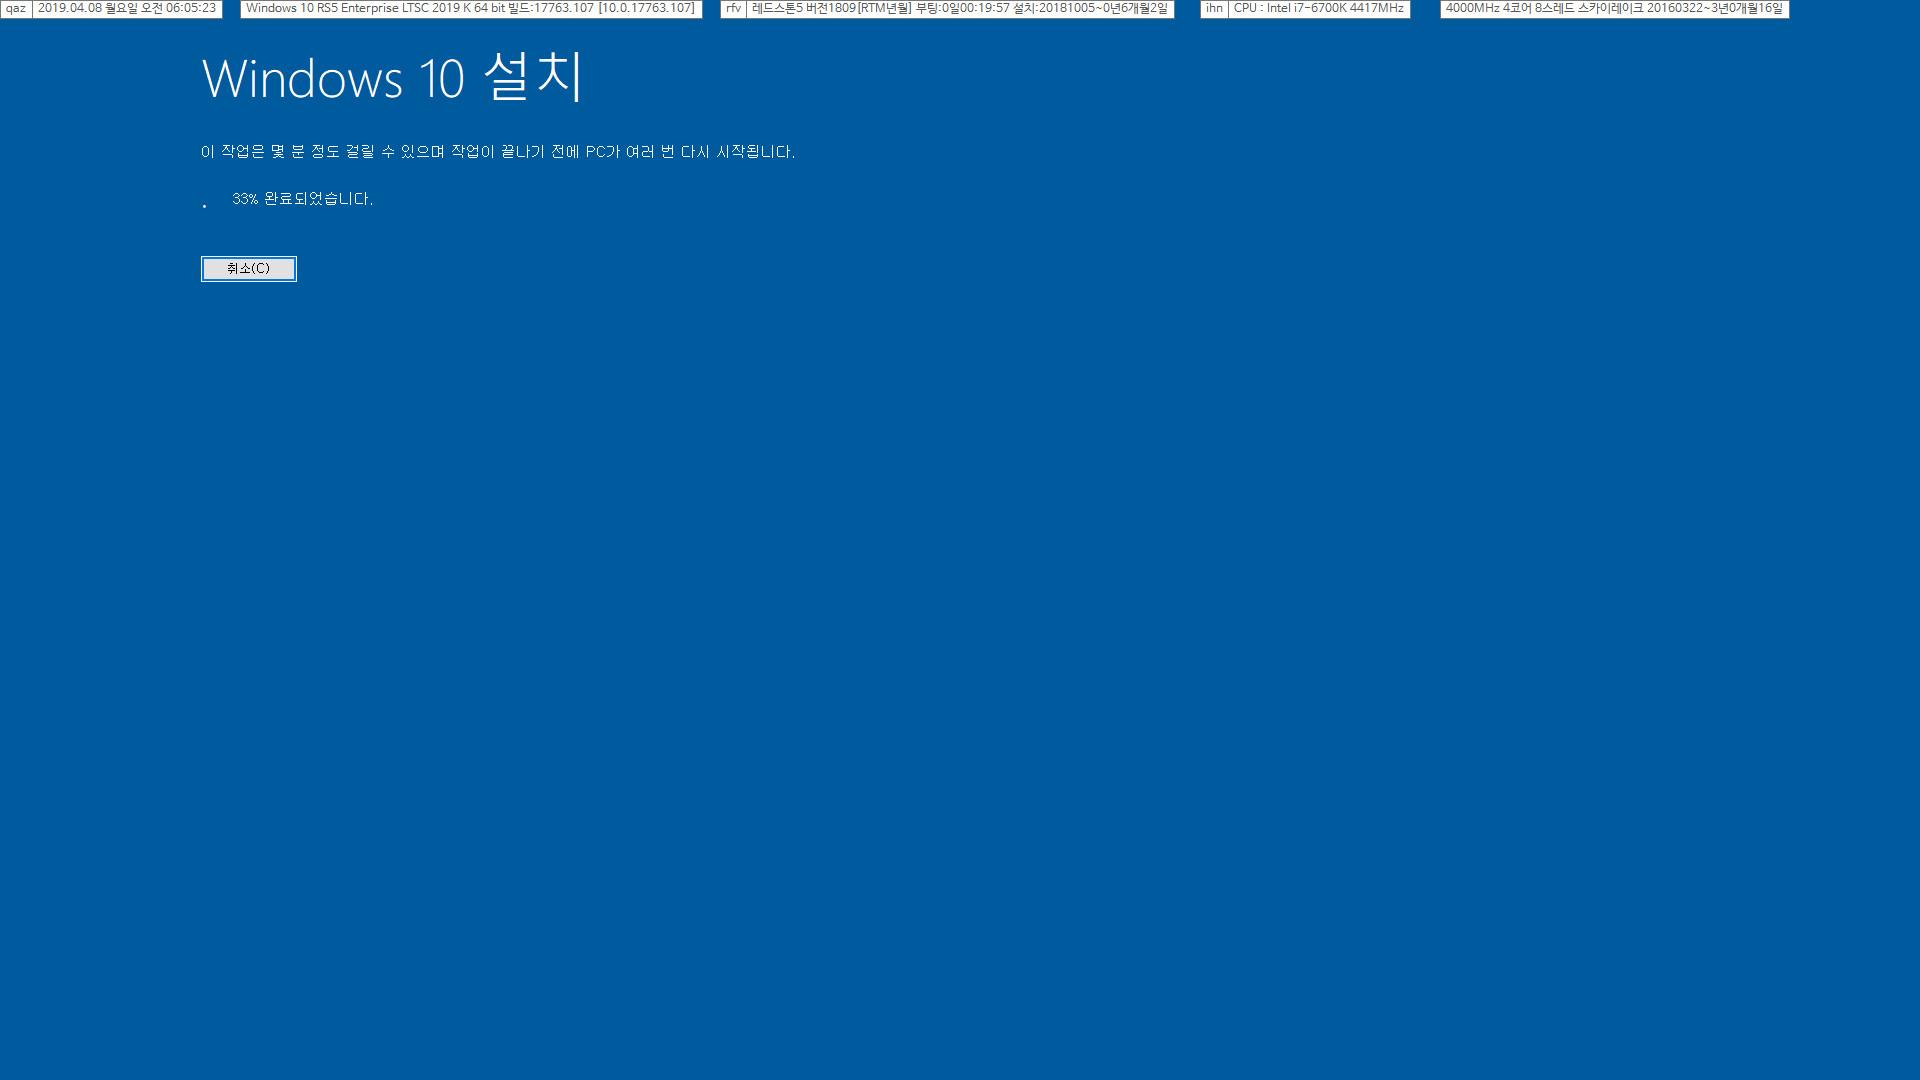 Windows 10 버전1809, 2019 LTSC 에서 버전1903 으로 업그레이드하여 vmware 상태 확인 테스트 - 엔터프라이즈 kms 키 사용함 - 앱 유지도 됨 2019-04-08_060523.jpg